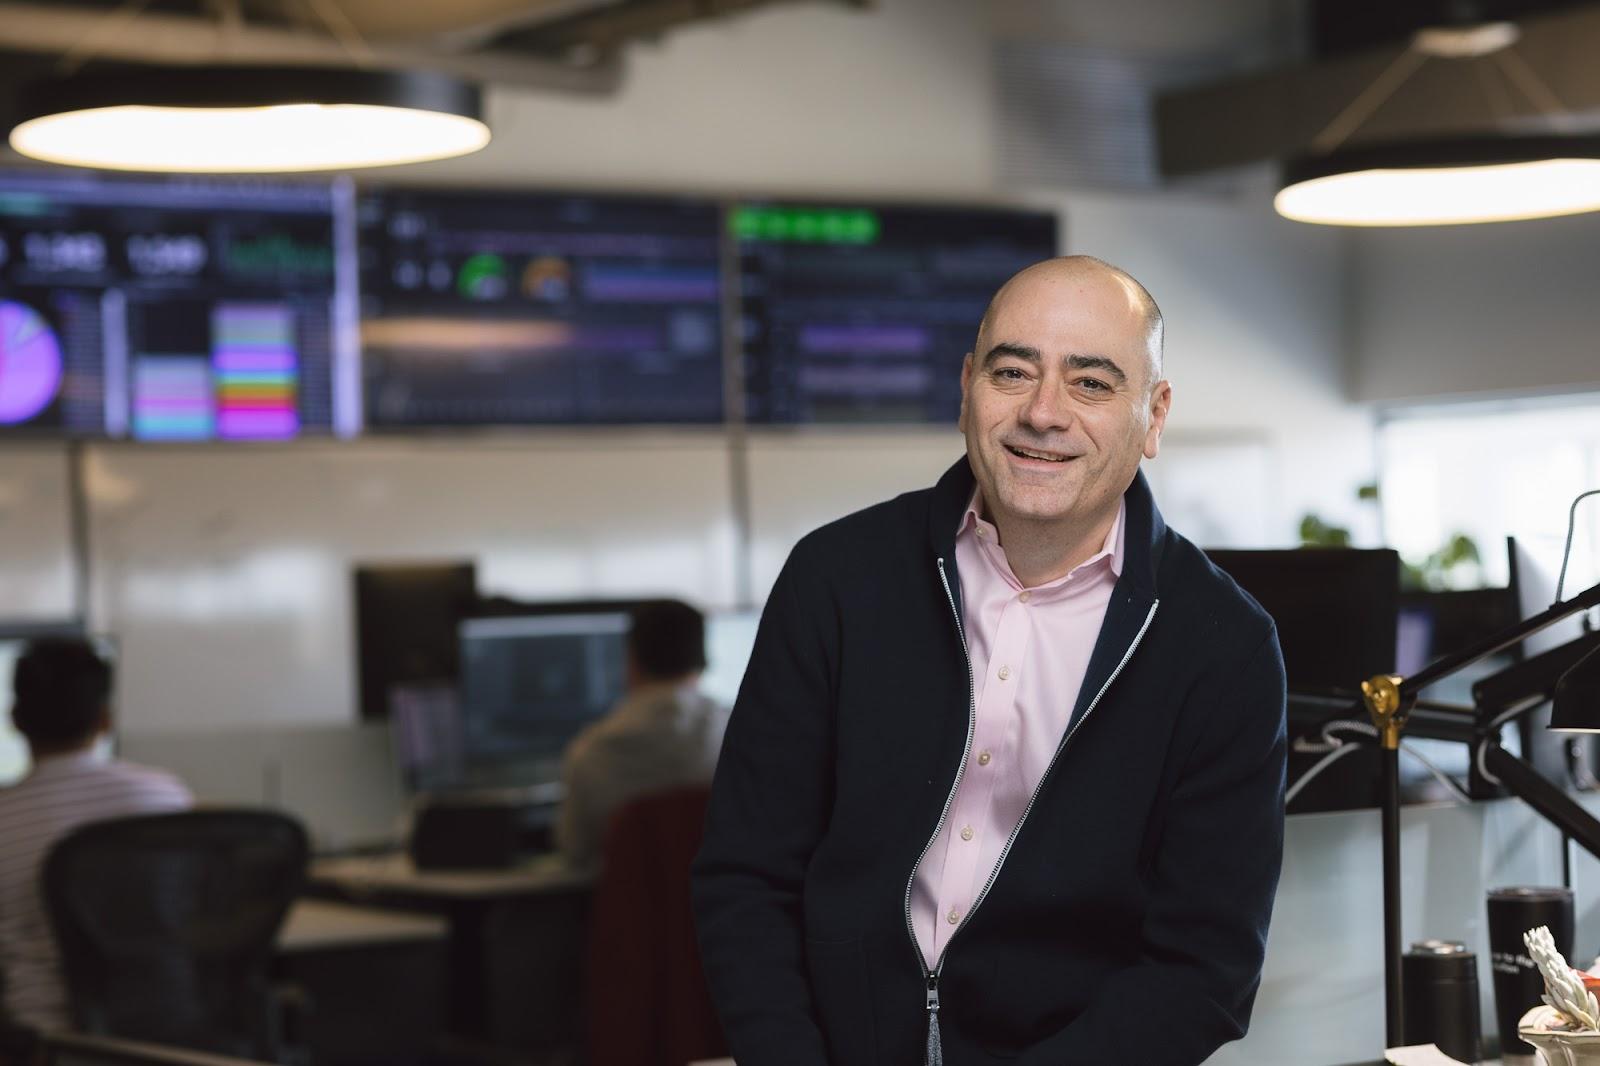 TrinetX's CEO Gadi Lachman